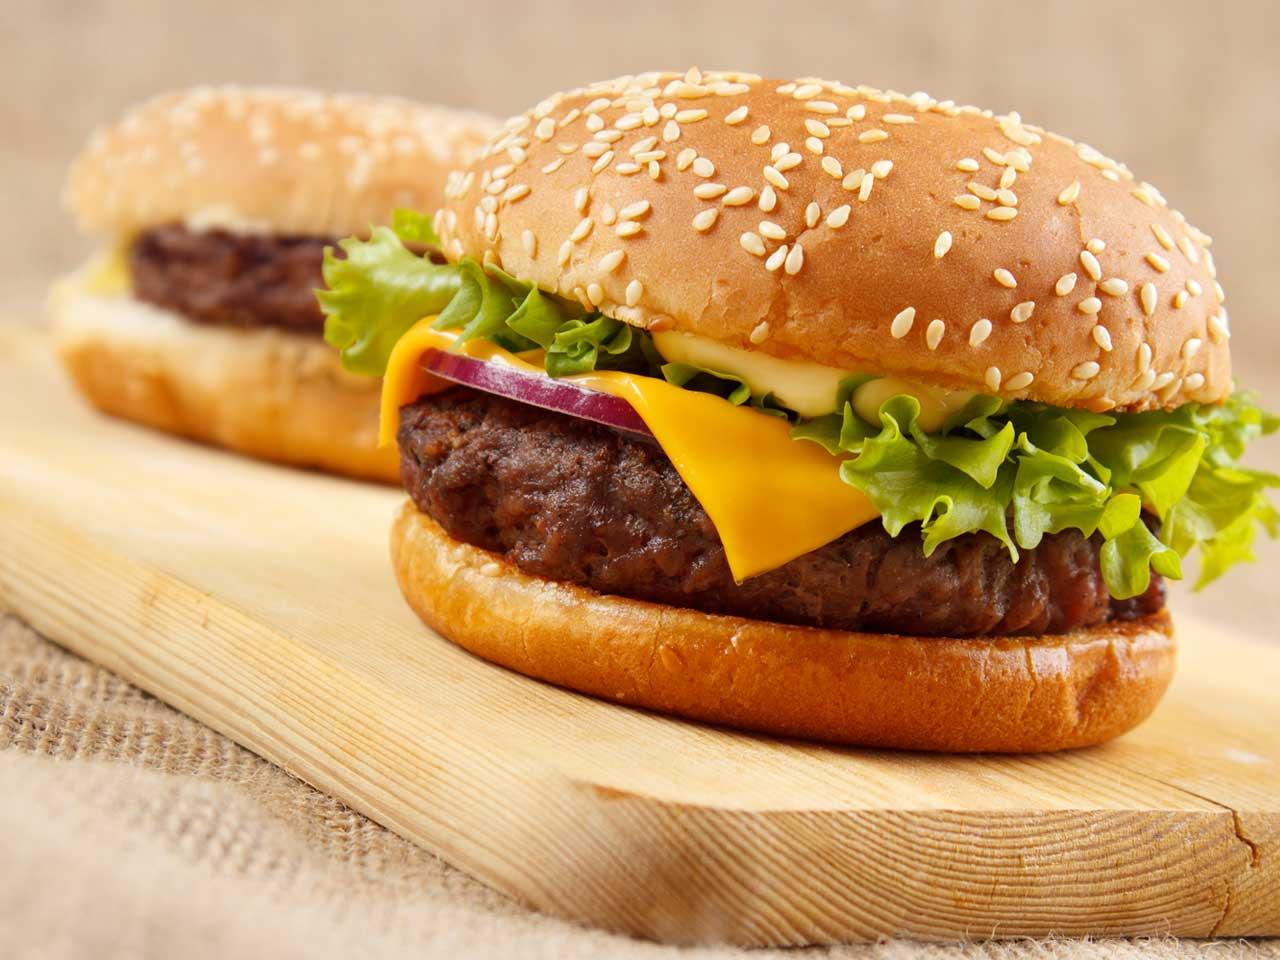 How to make a classic American burger - Saga